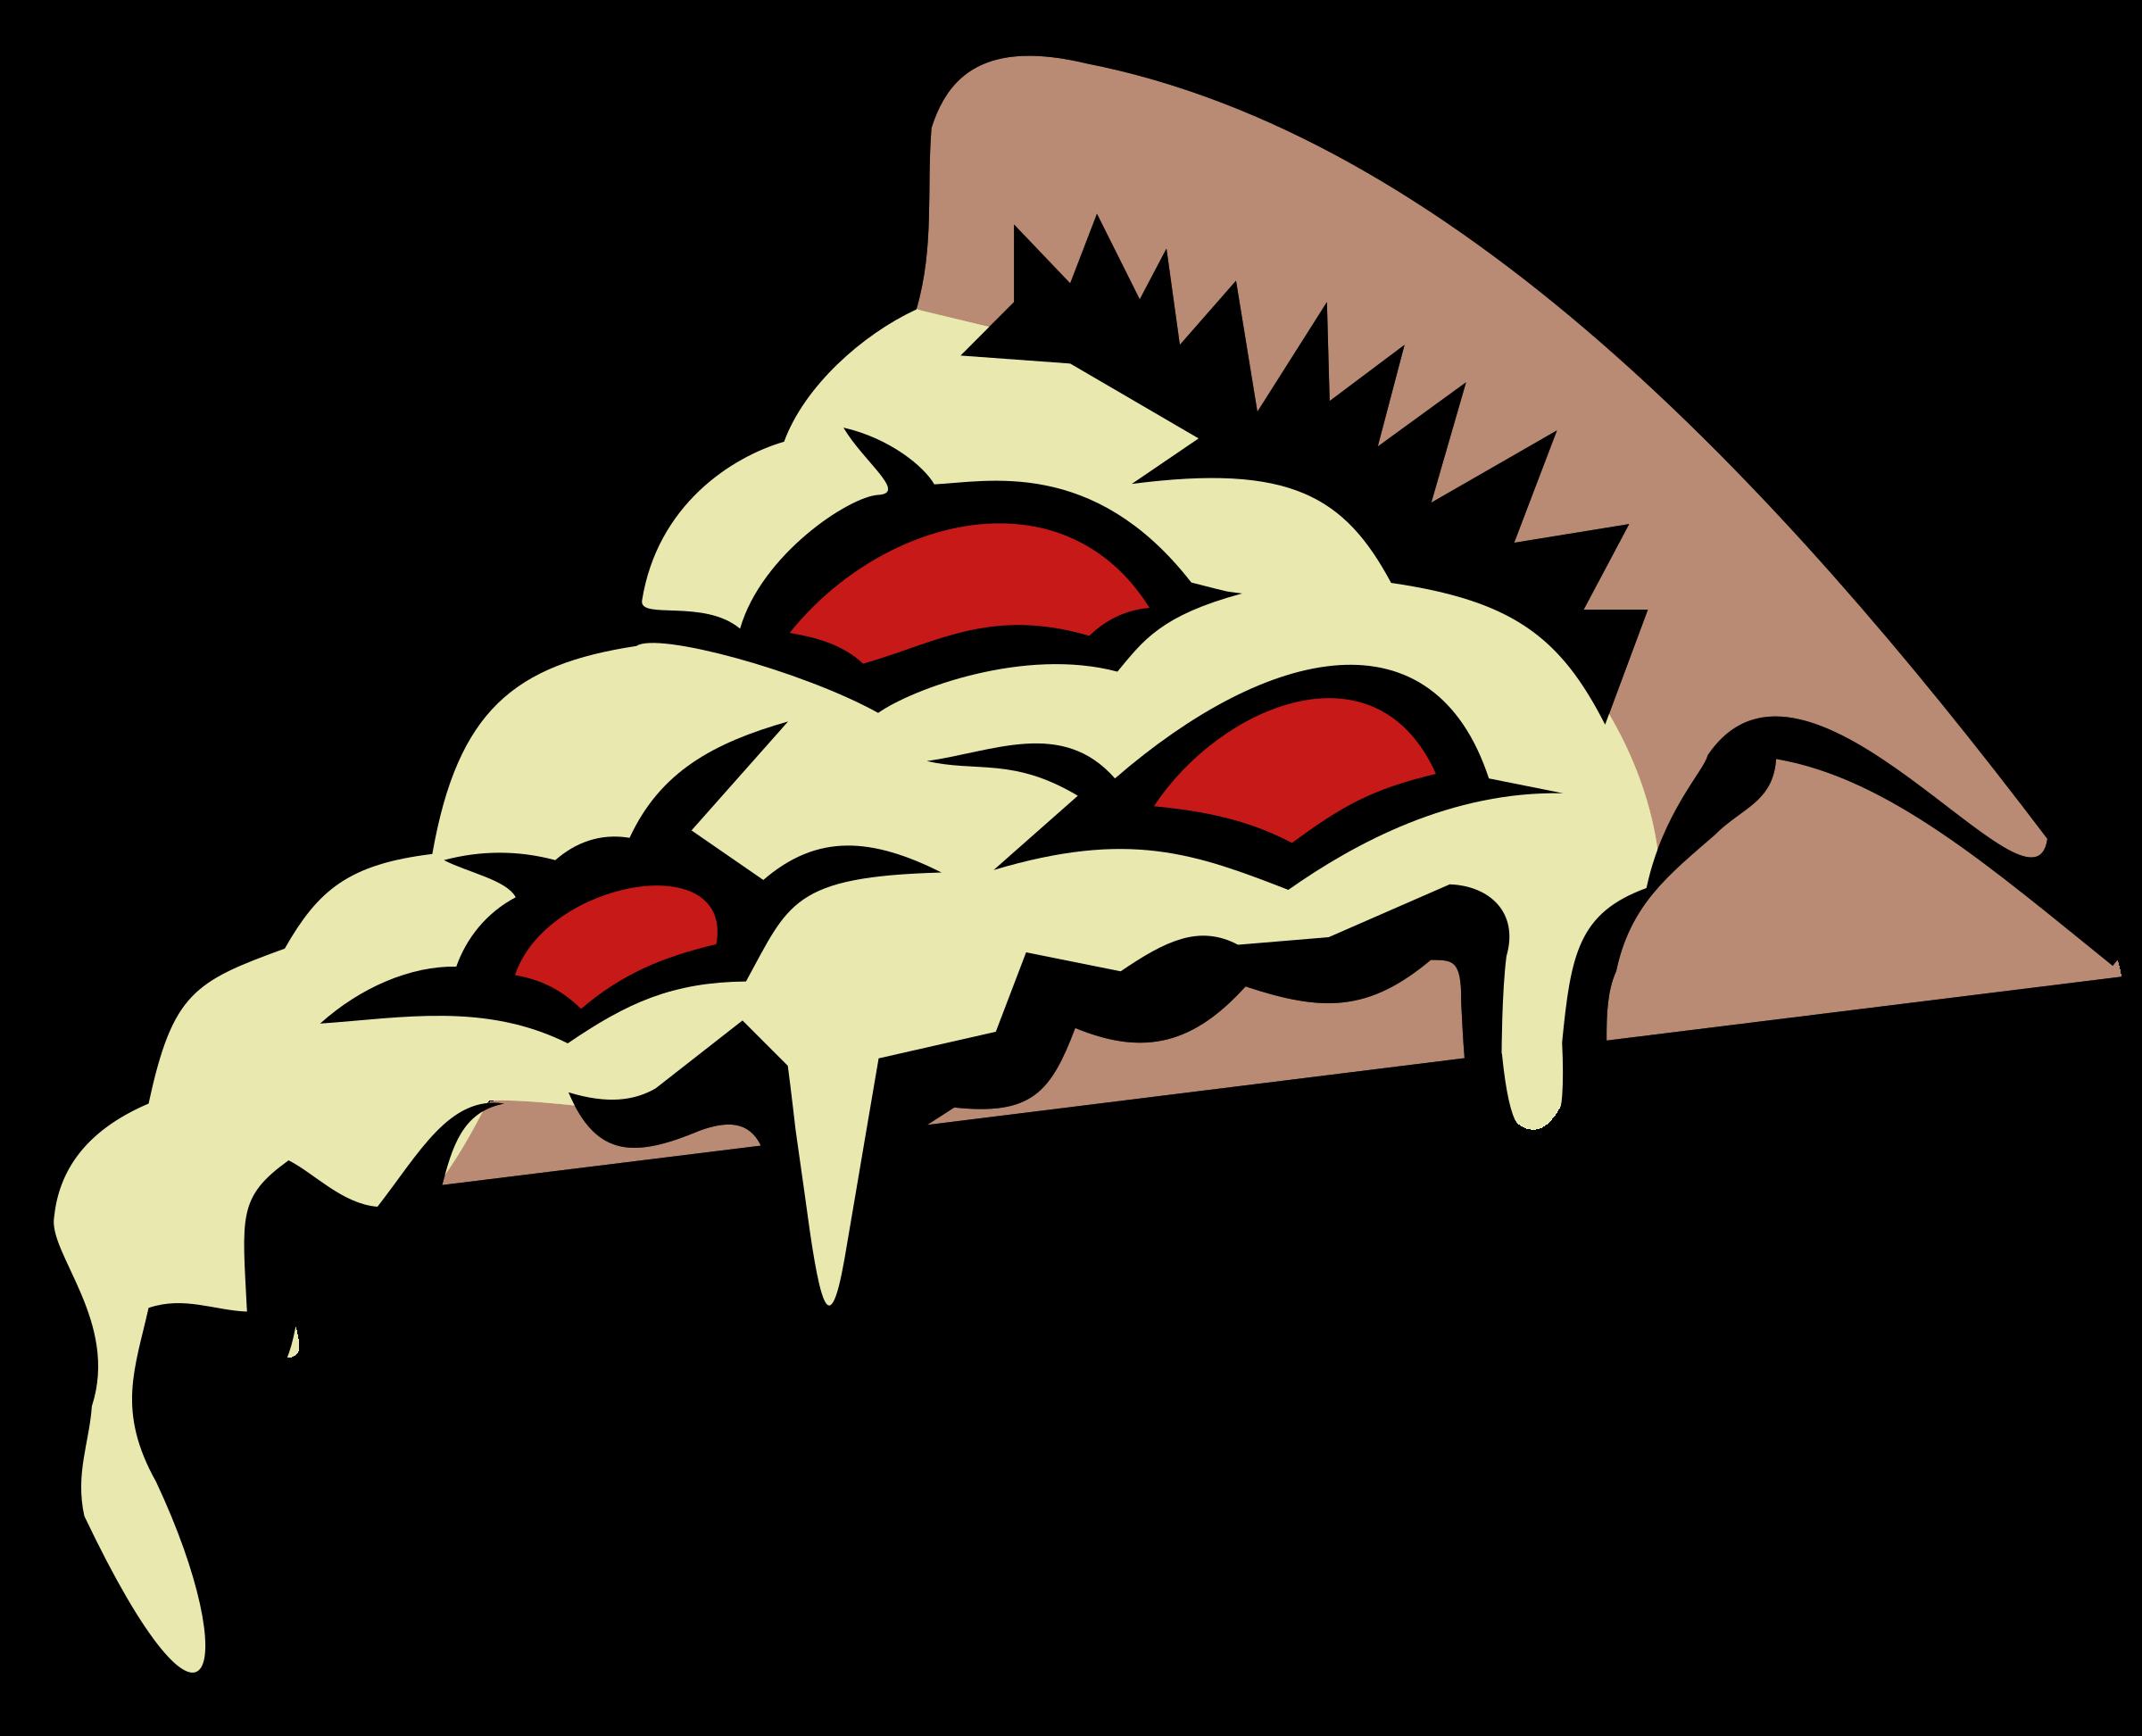 Pizza clipart pop, Pizza pop Transparent FREE for download.